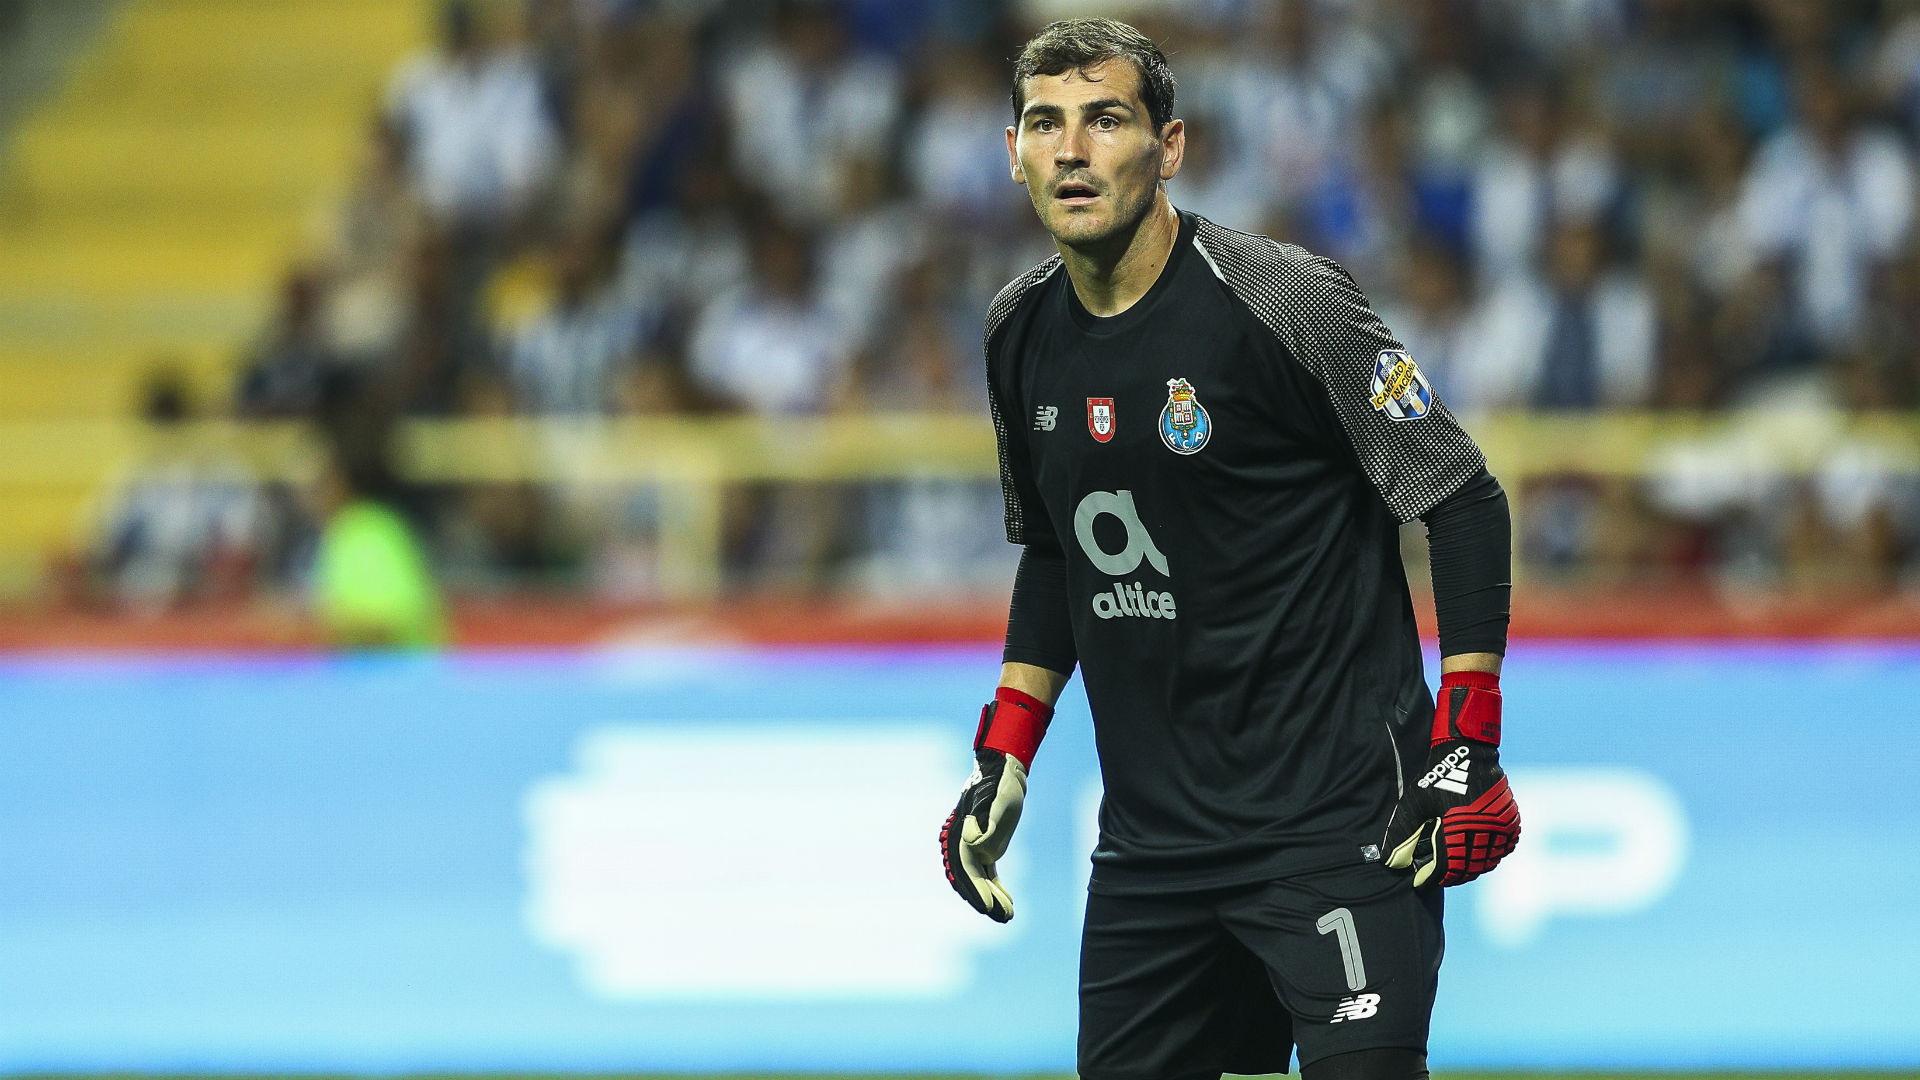 10c9d01bc Casillas features in landmark 20th Champions League campaign ...